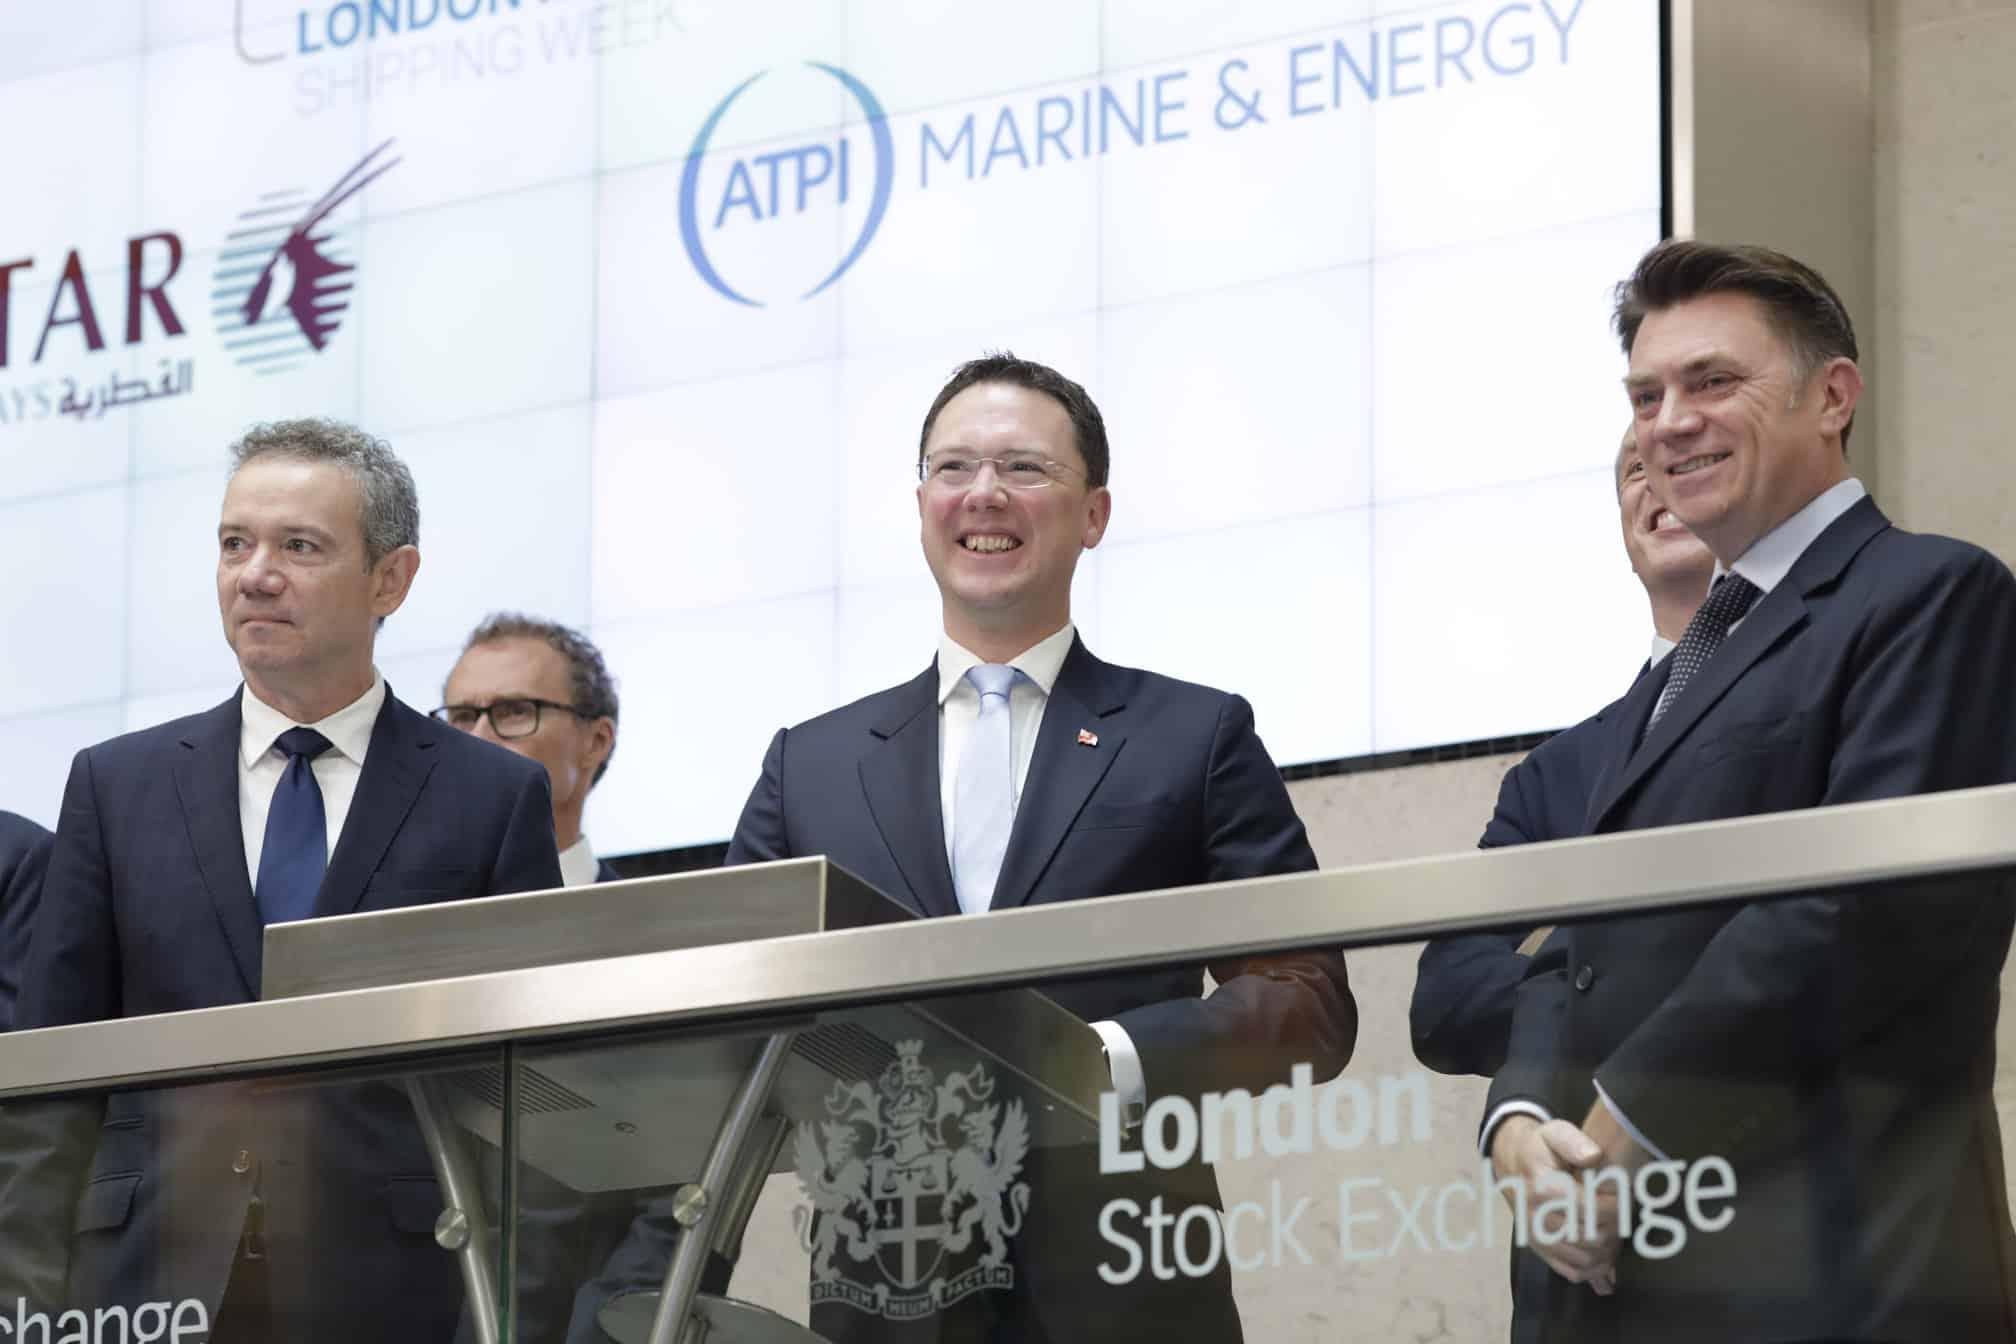 ATPI Marine & Energy and Qatar Airways open London International Shipping Week